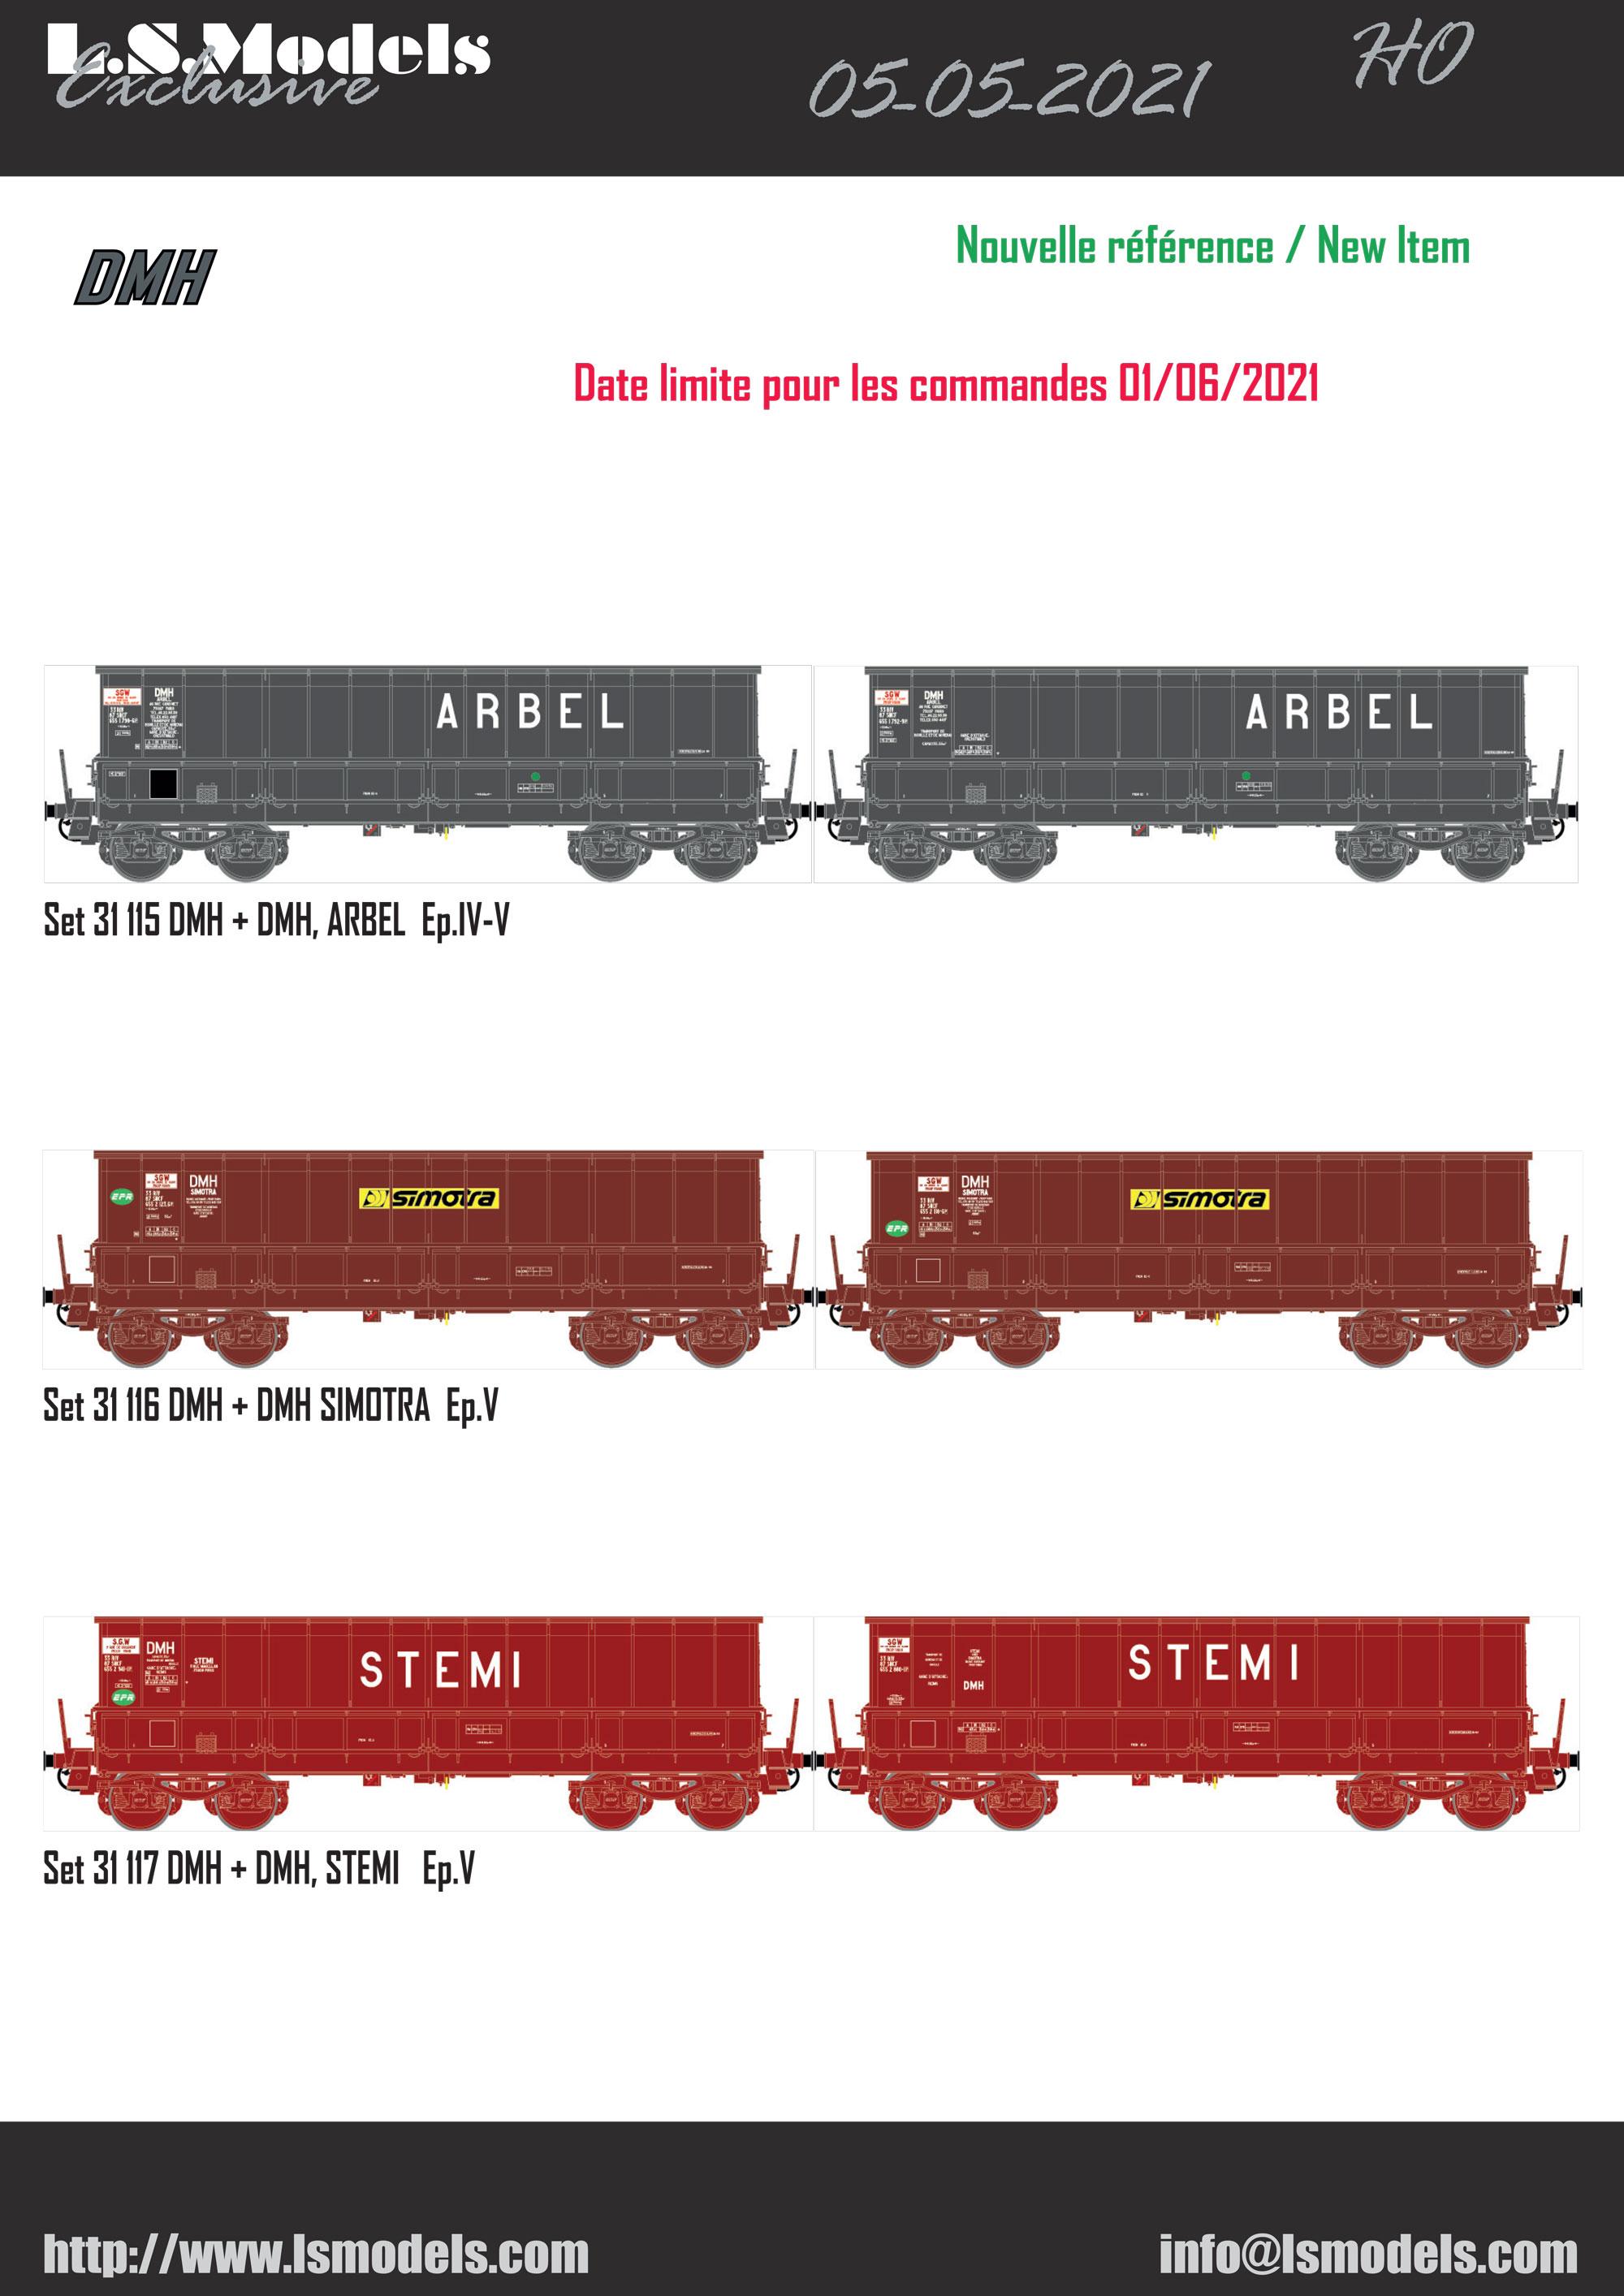 LS Models - DC, DM & DMH freight wagons